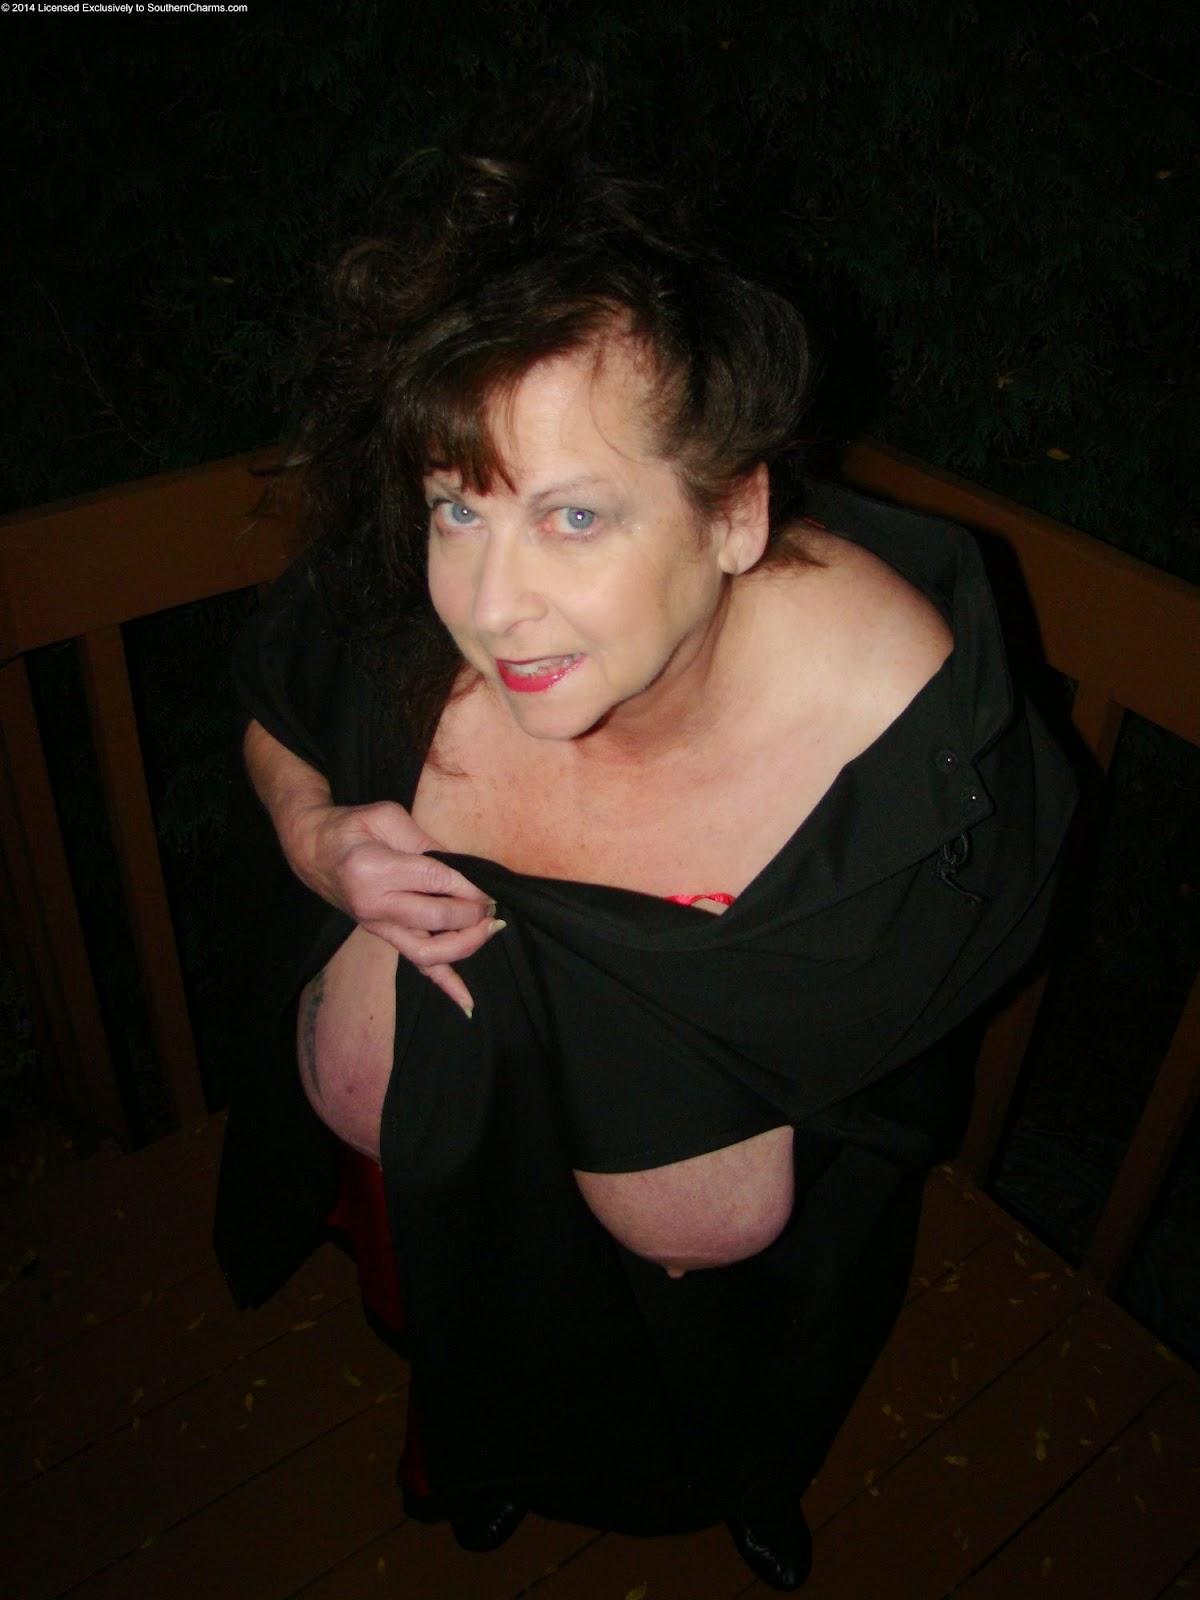 http://www.vampirebeauties.com/2014/10/vampire-model-alyee-b.html